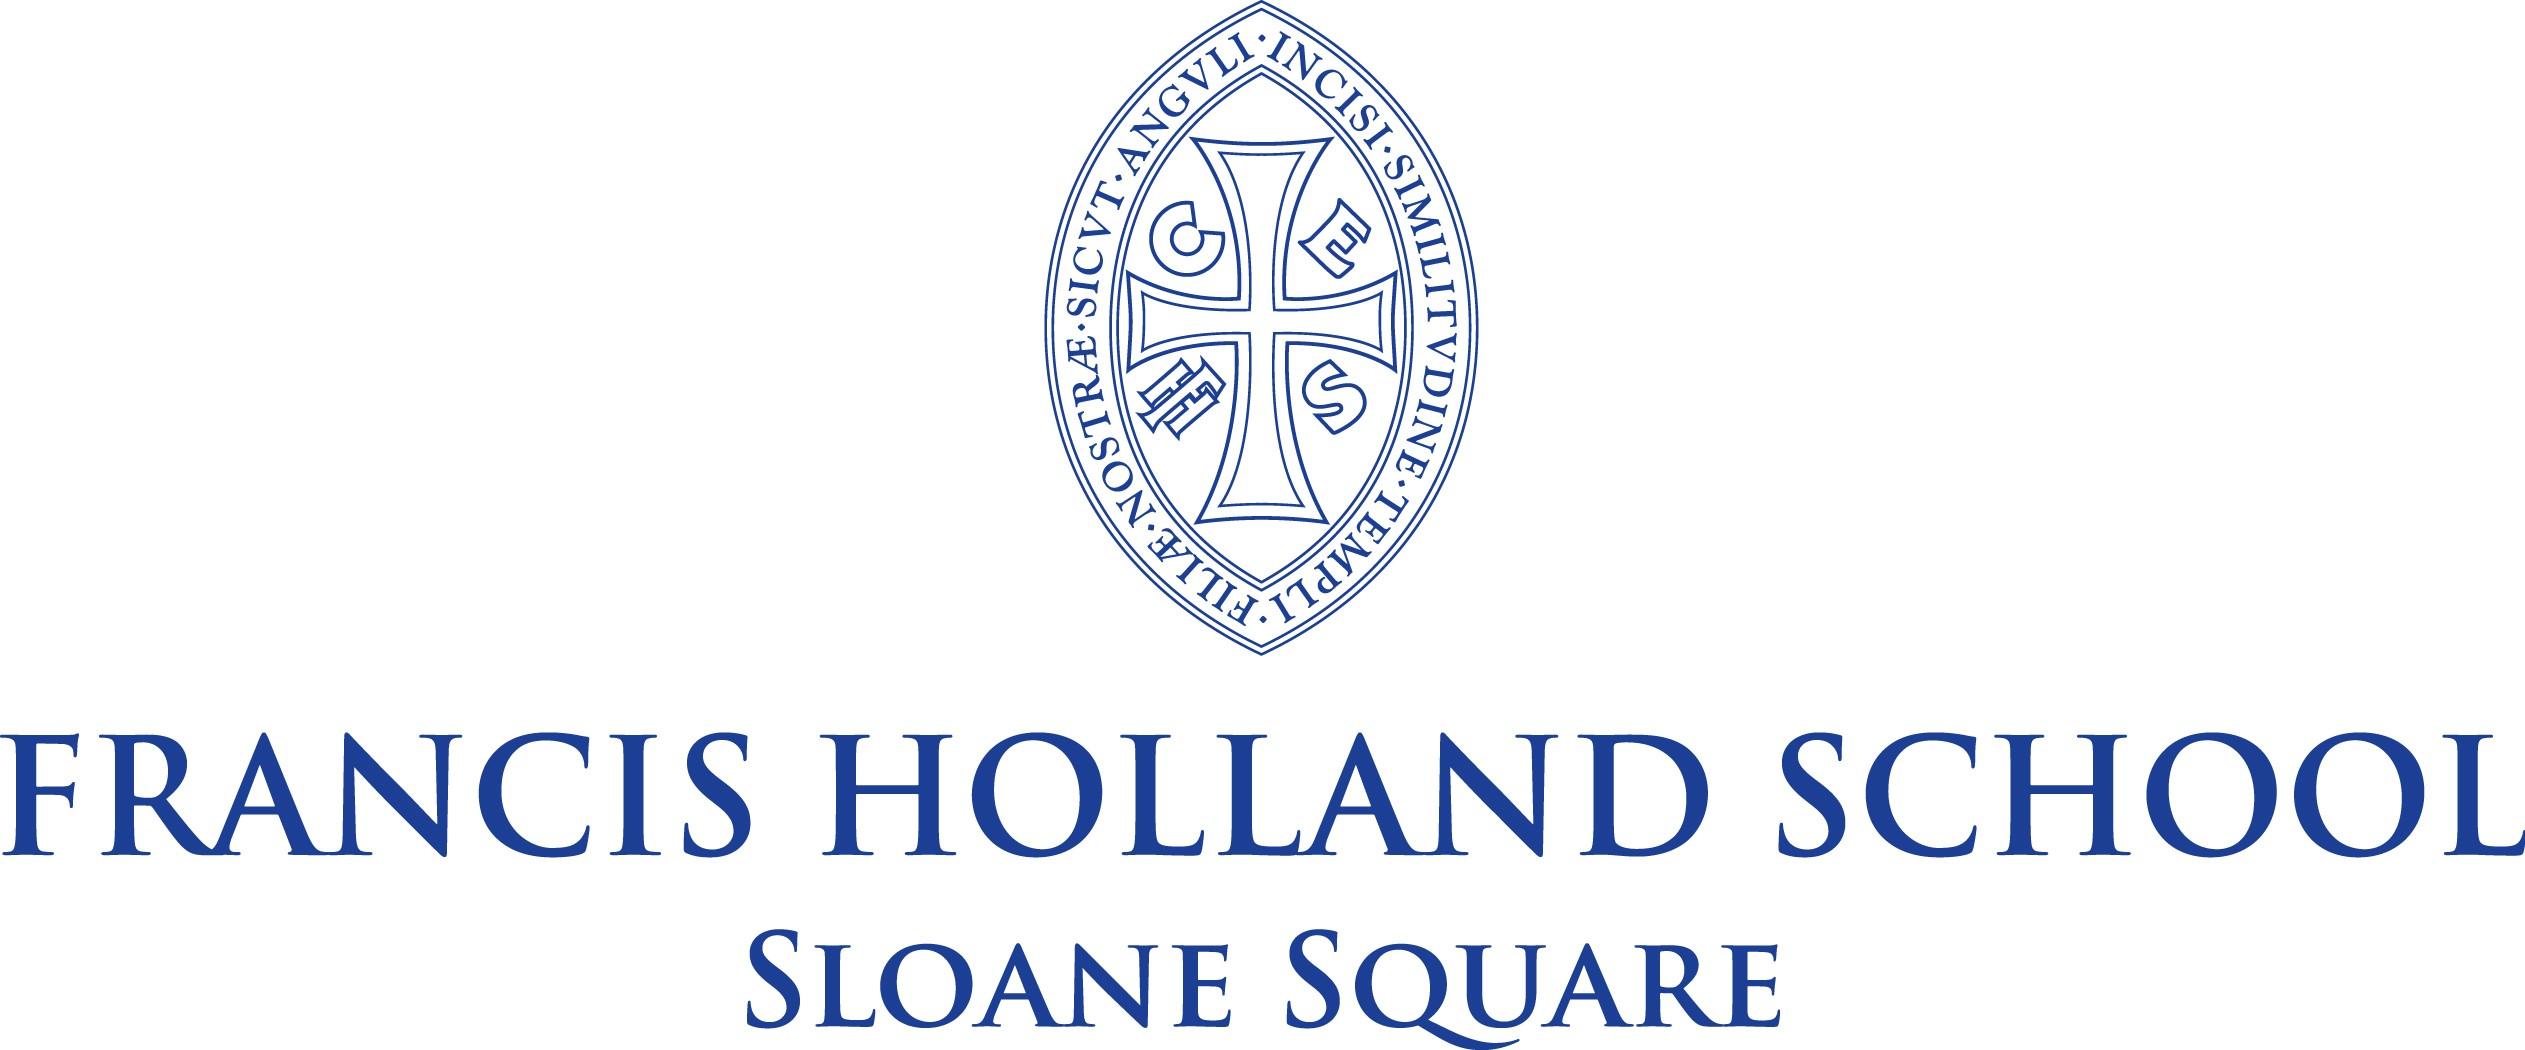 Francis Holland School